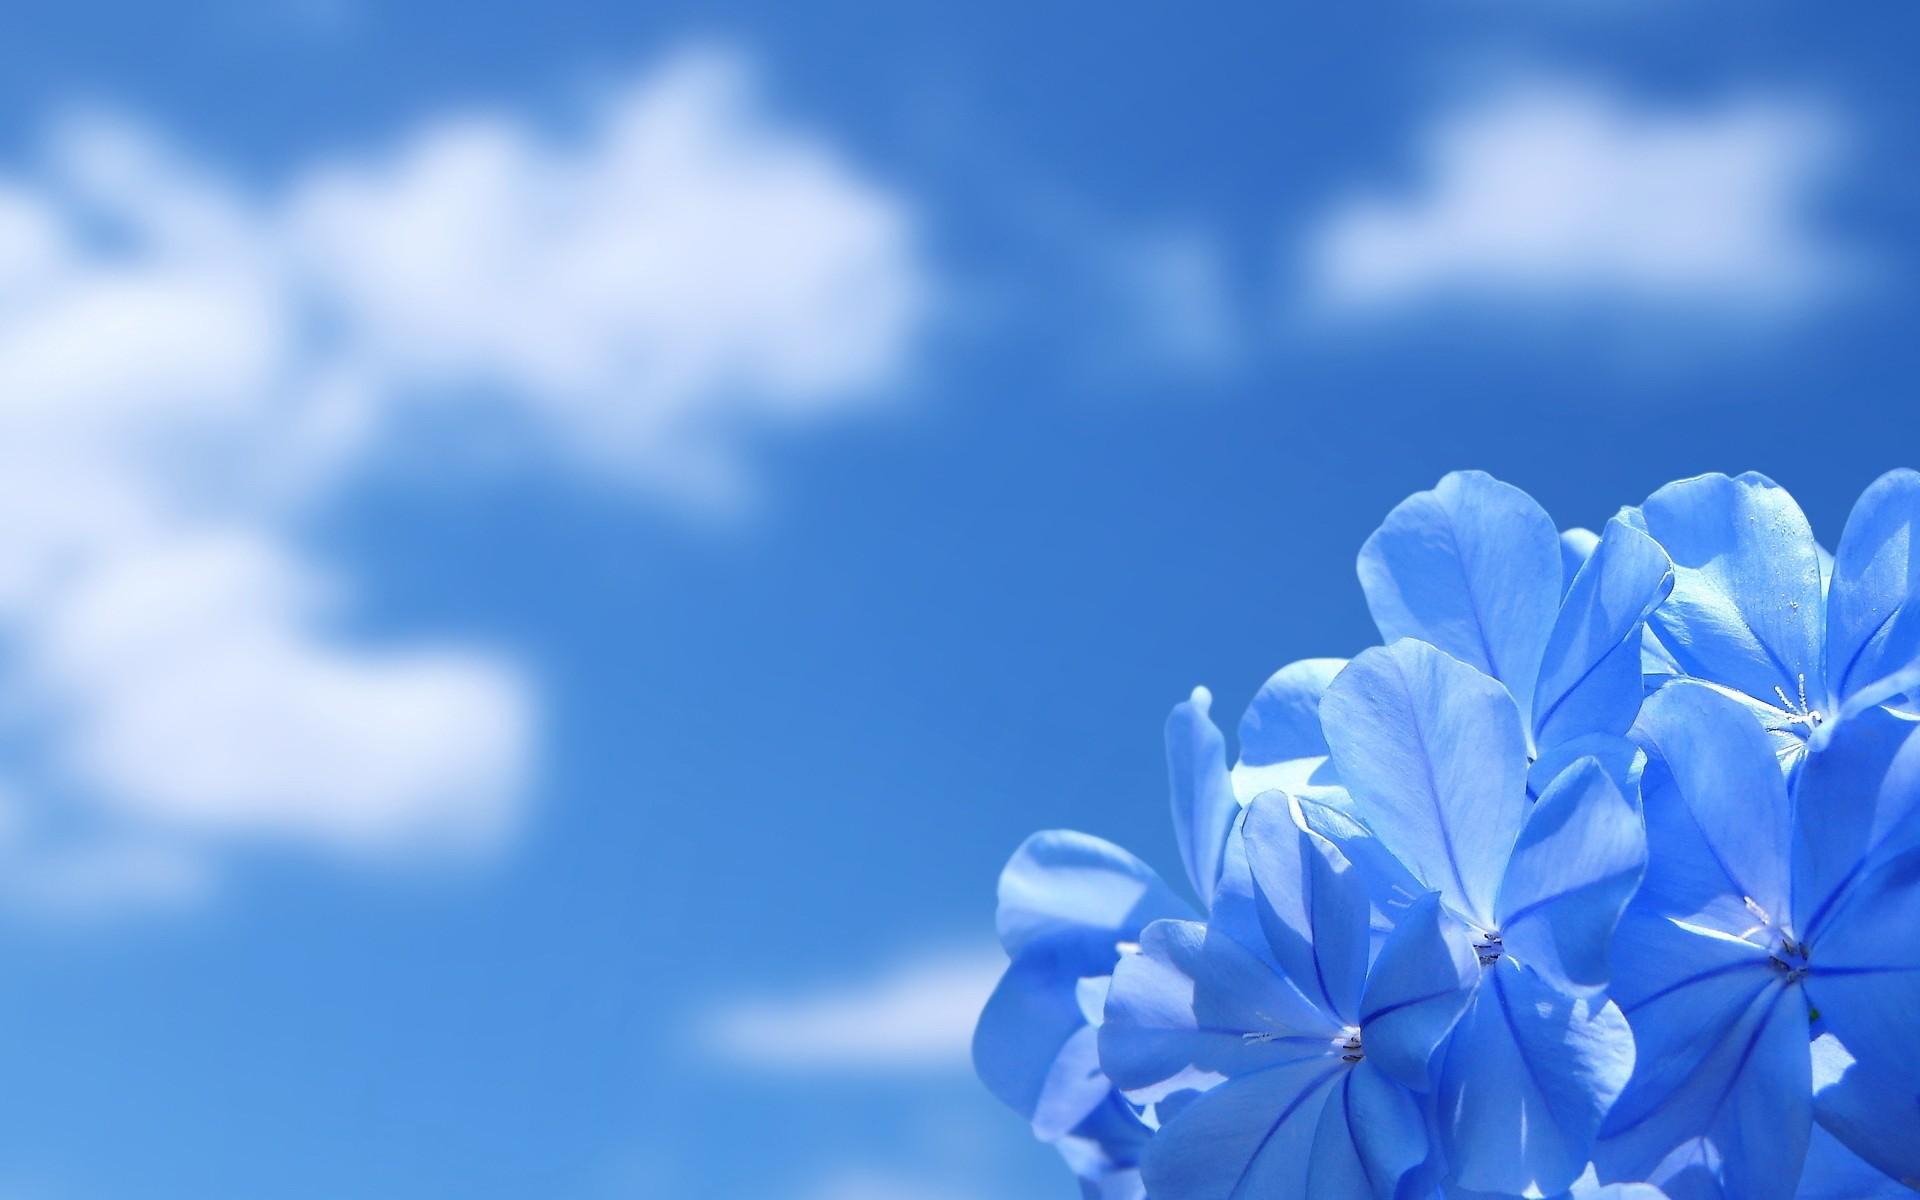 Desktop blue wallpapers | HD Wallpaper